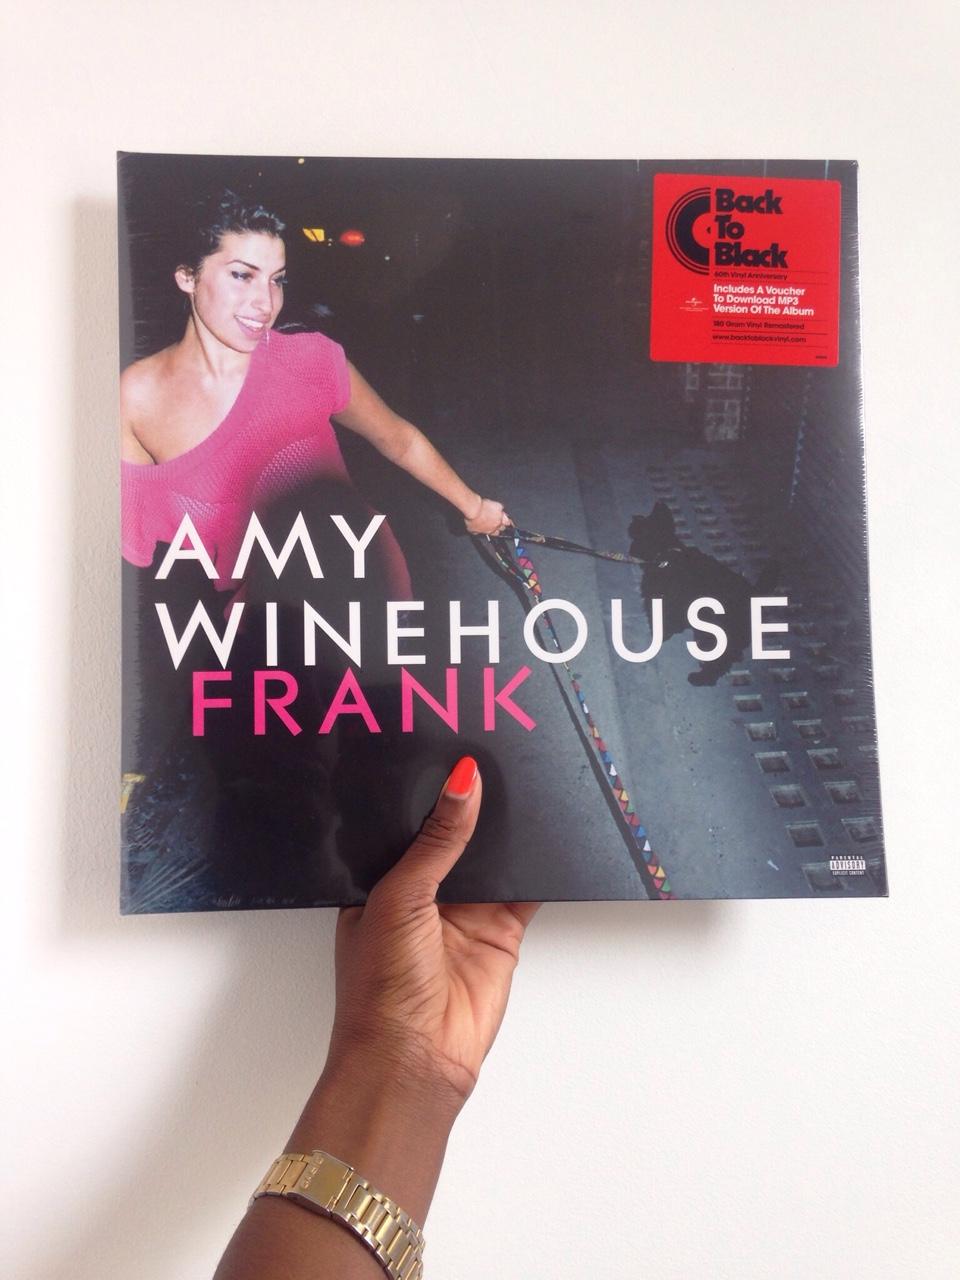 amy winehouse vinyl.jpg